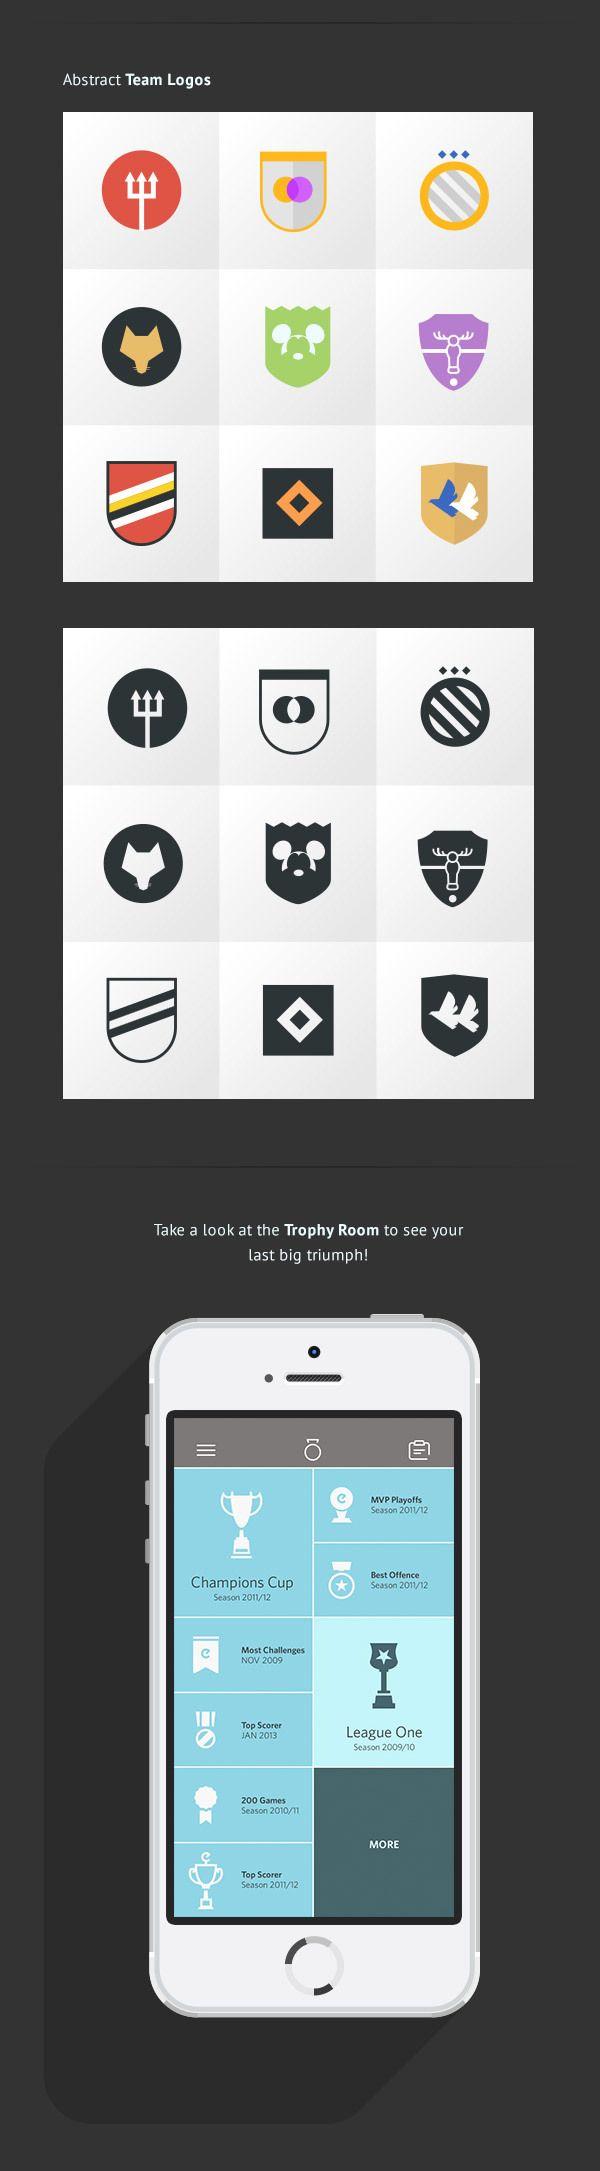 eKickr Mobile App [badges] by Lukas Bischoff, via Behance